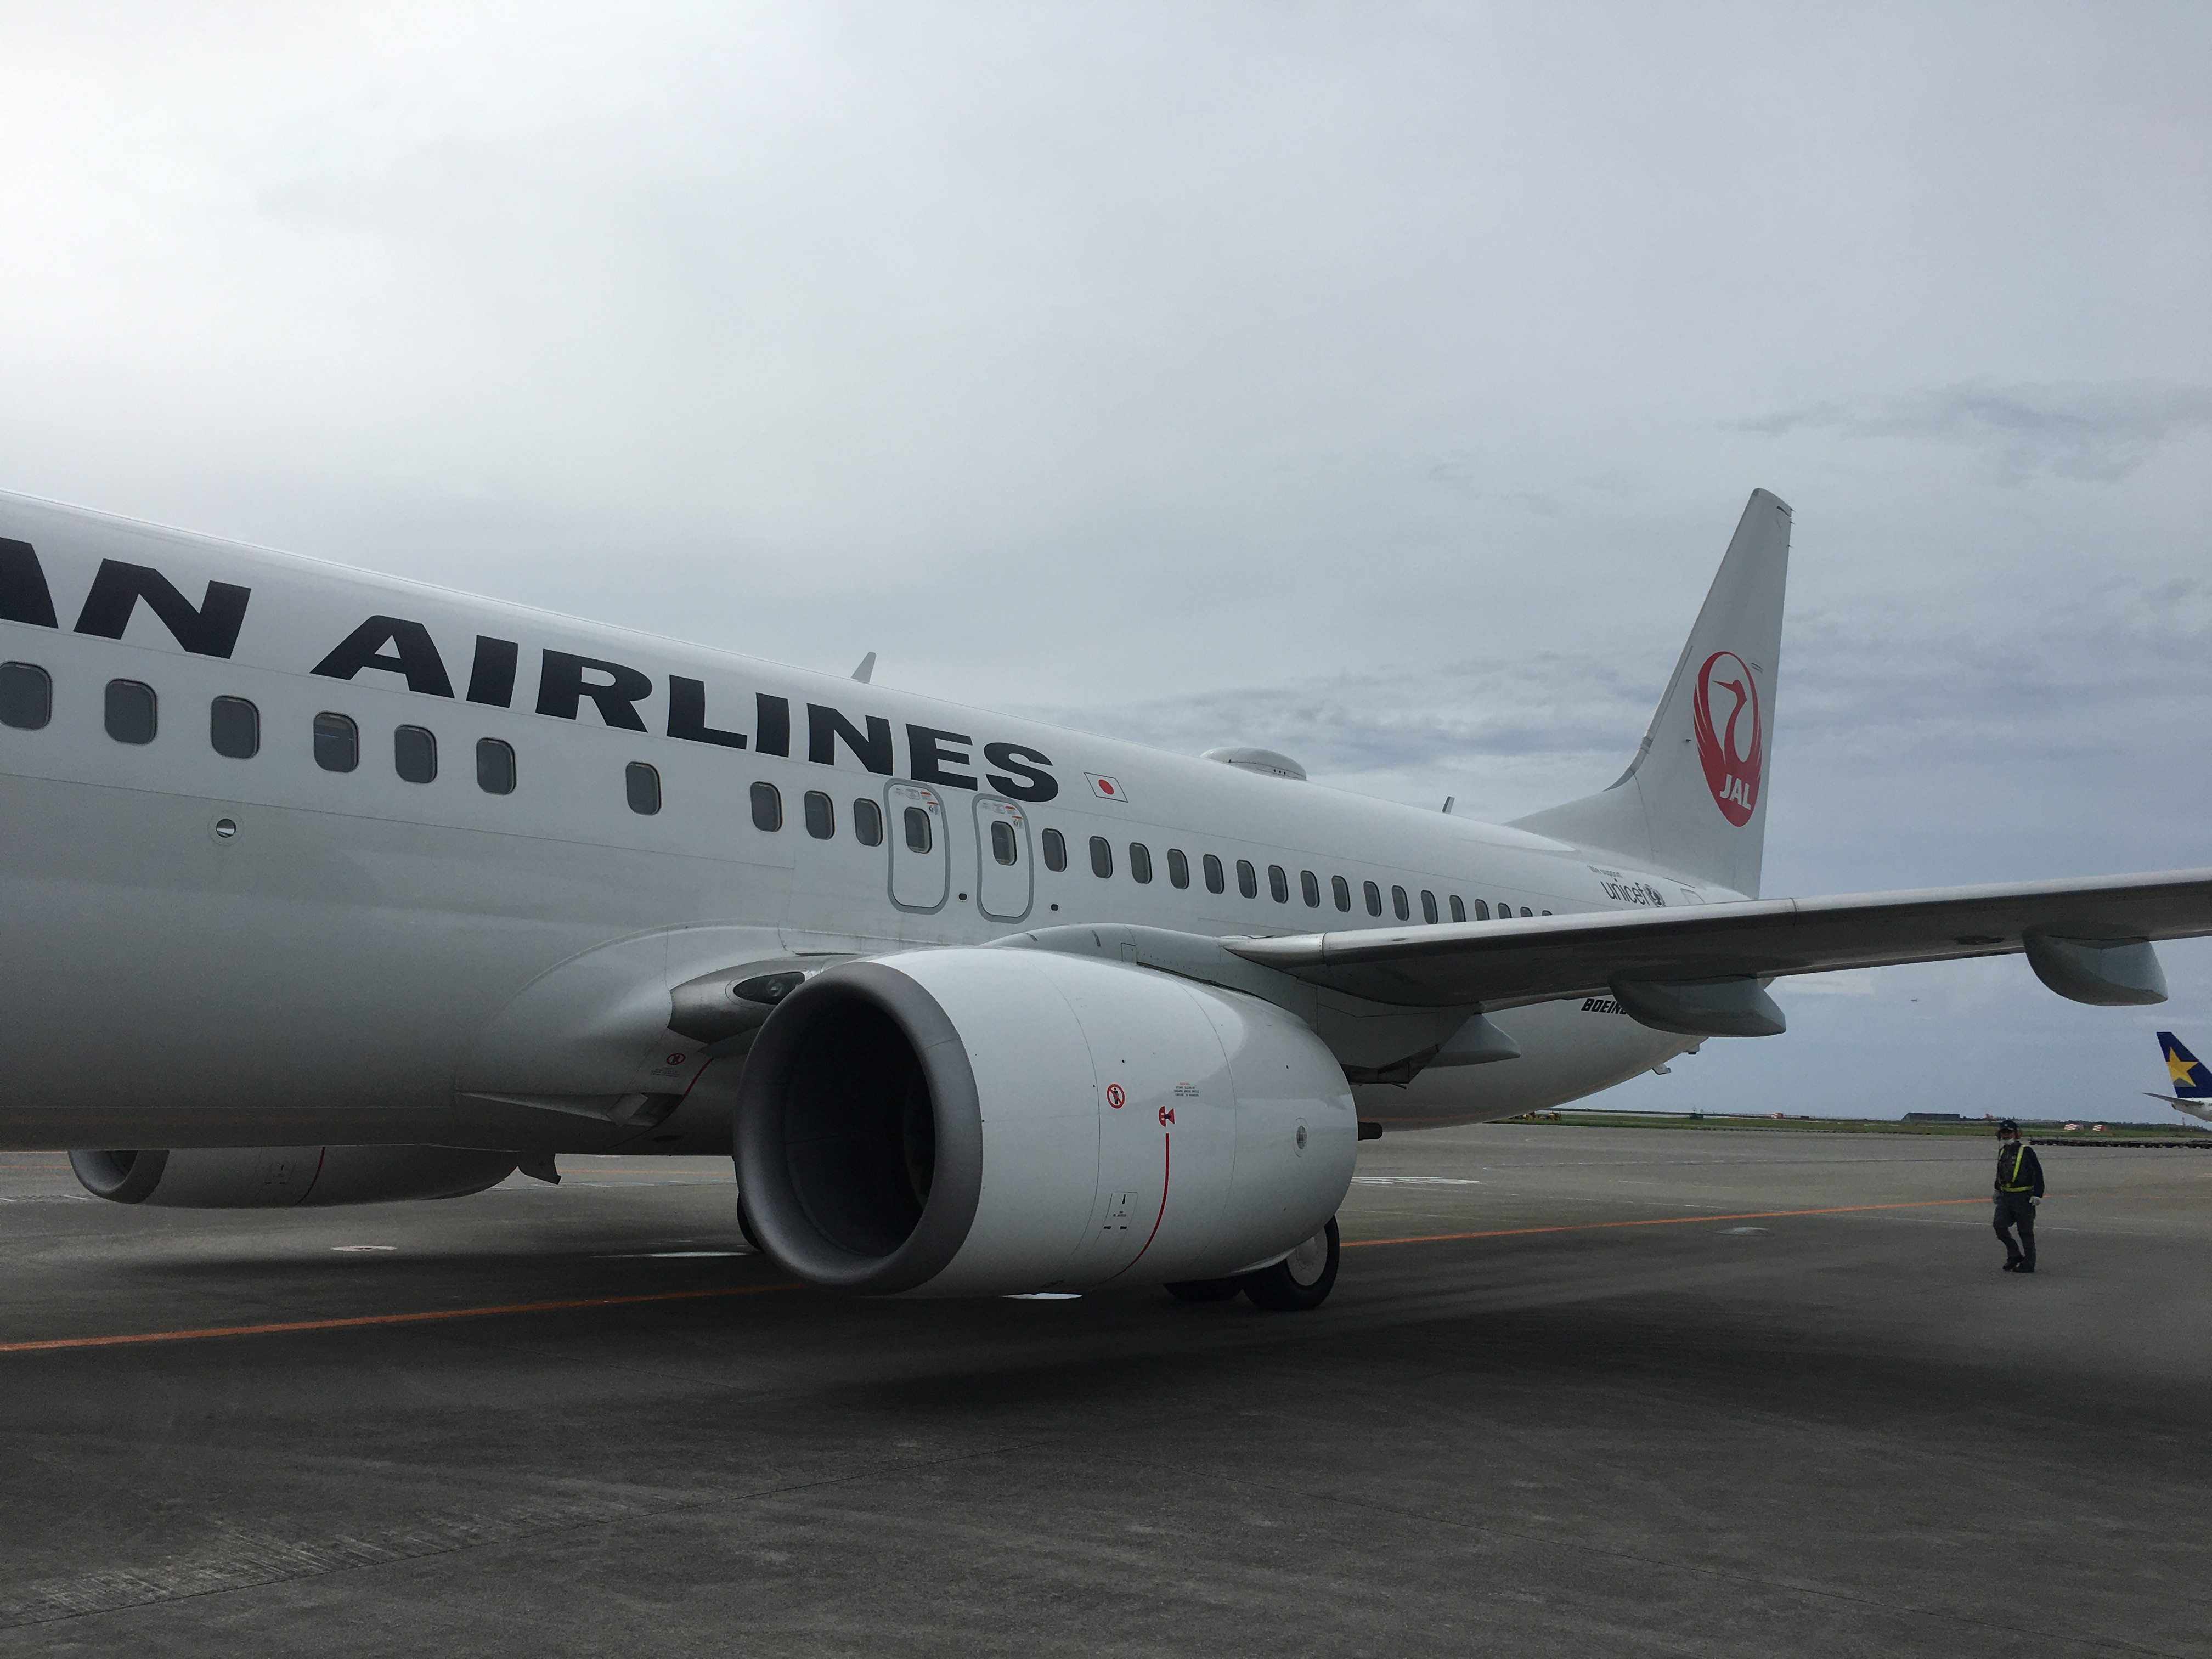 日本航空(JL) JL996(那覇(OKA) – 羽田(HND))のWiFiスピードチェック